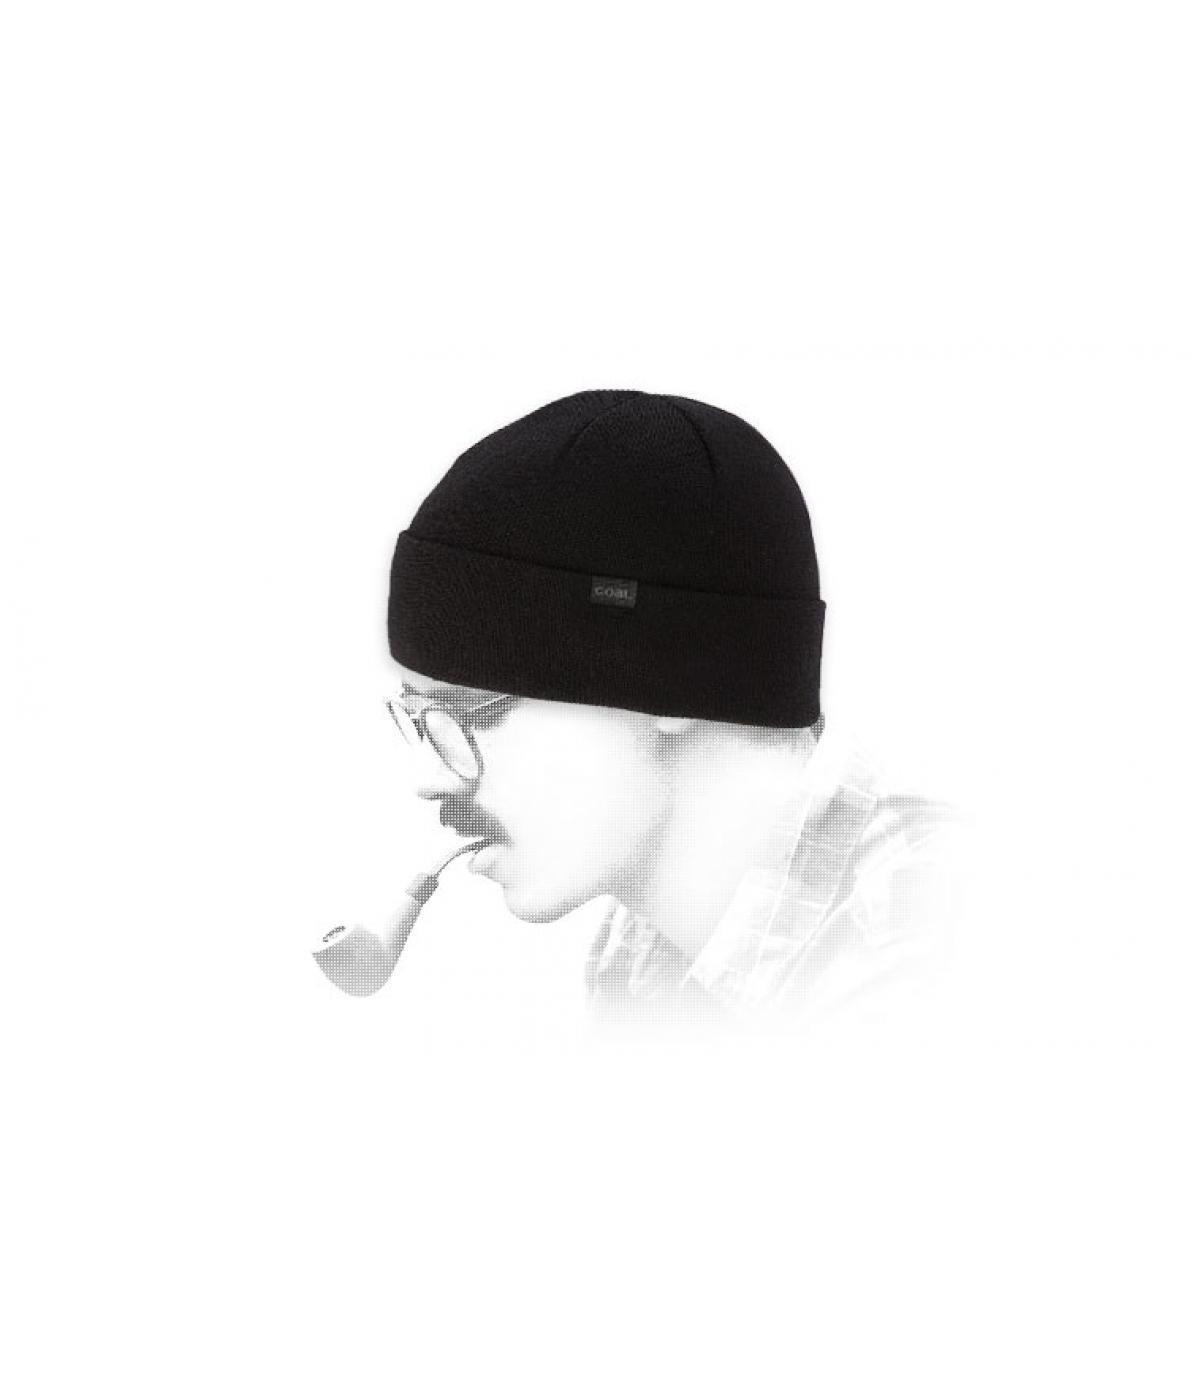 Mütze Merinowolle schwarz Coal